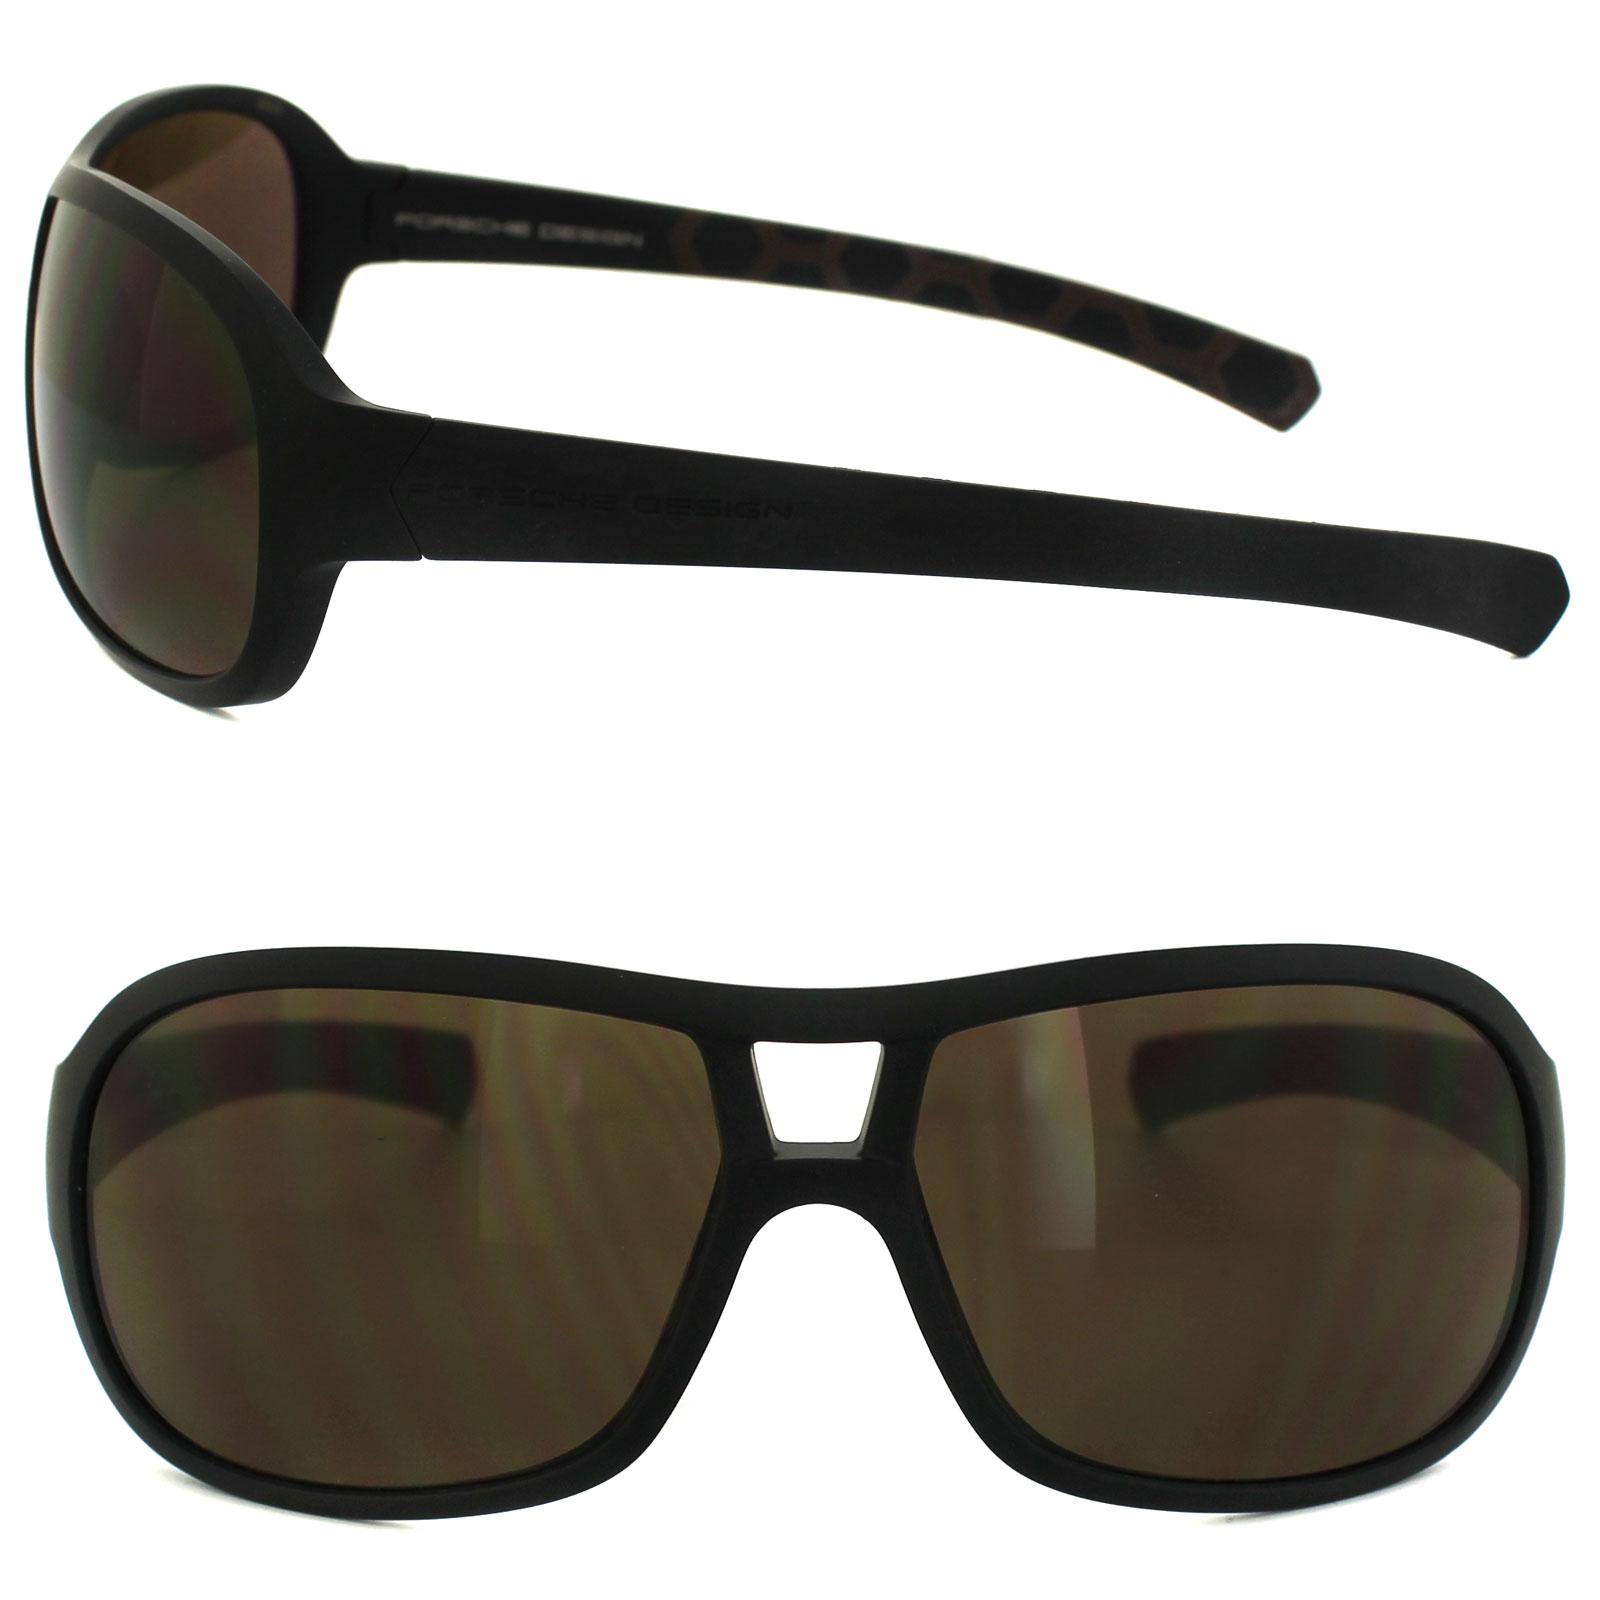 Cheap Porsche Design P8537 Sunglasses Discounted Sunglasses